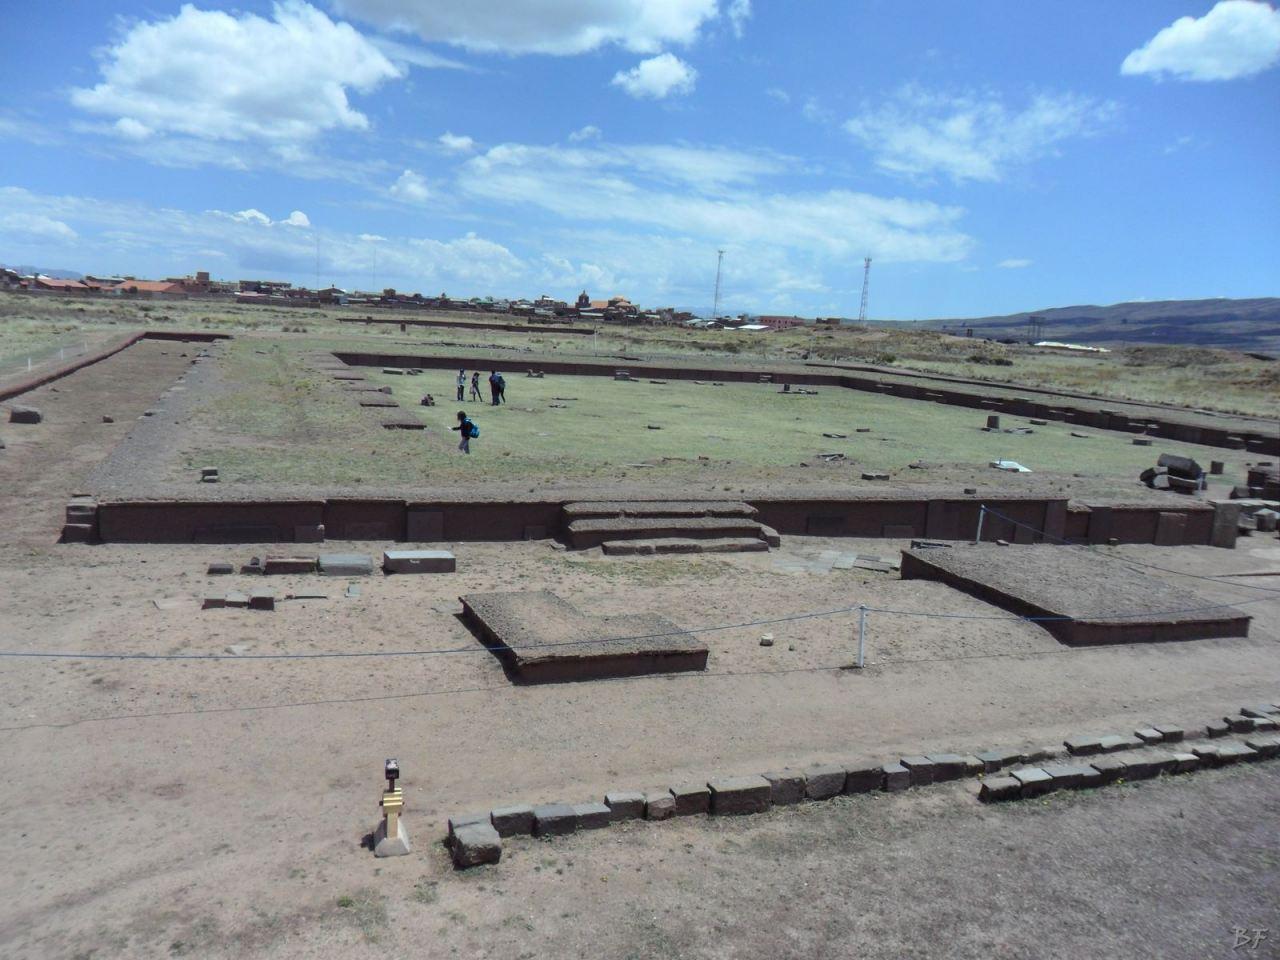 Sito-Megalitico-Piramide-Akapana-Kalasasaya-Menhir-Tiahuanaco-Bolivia-58